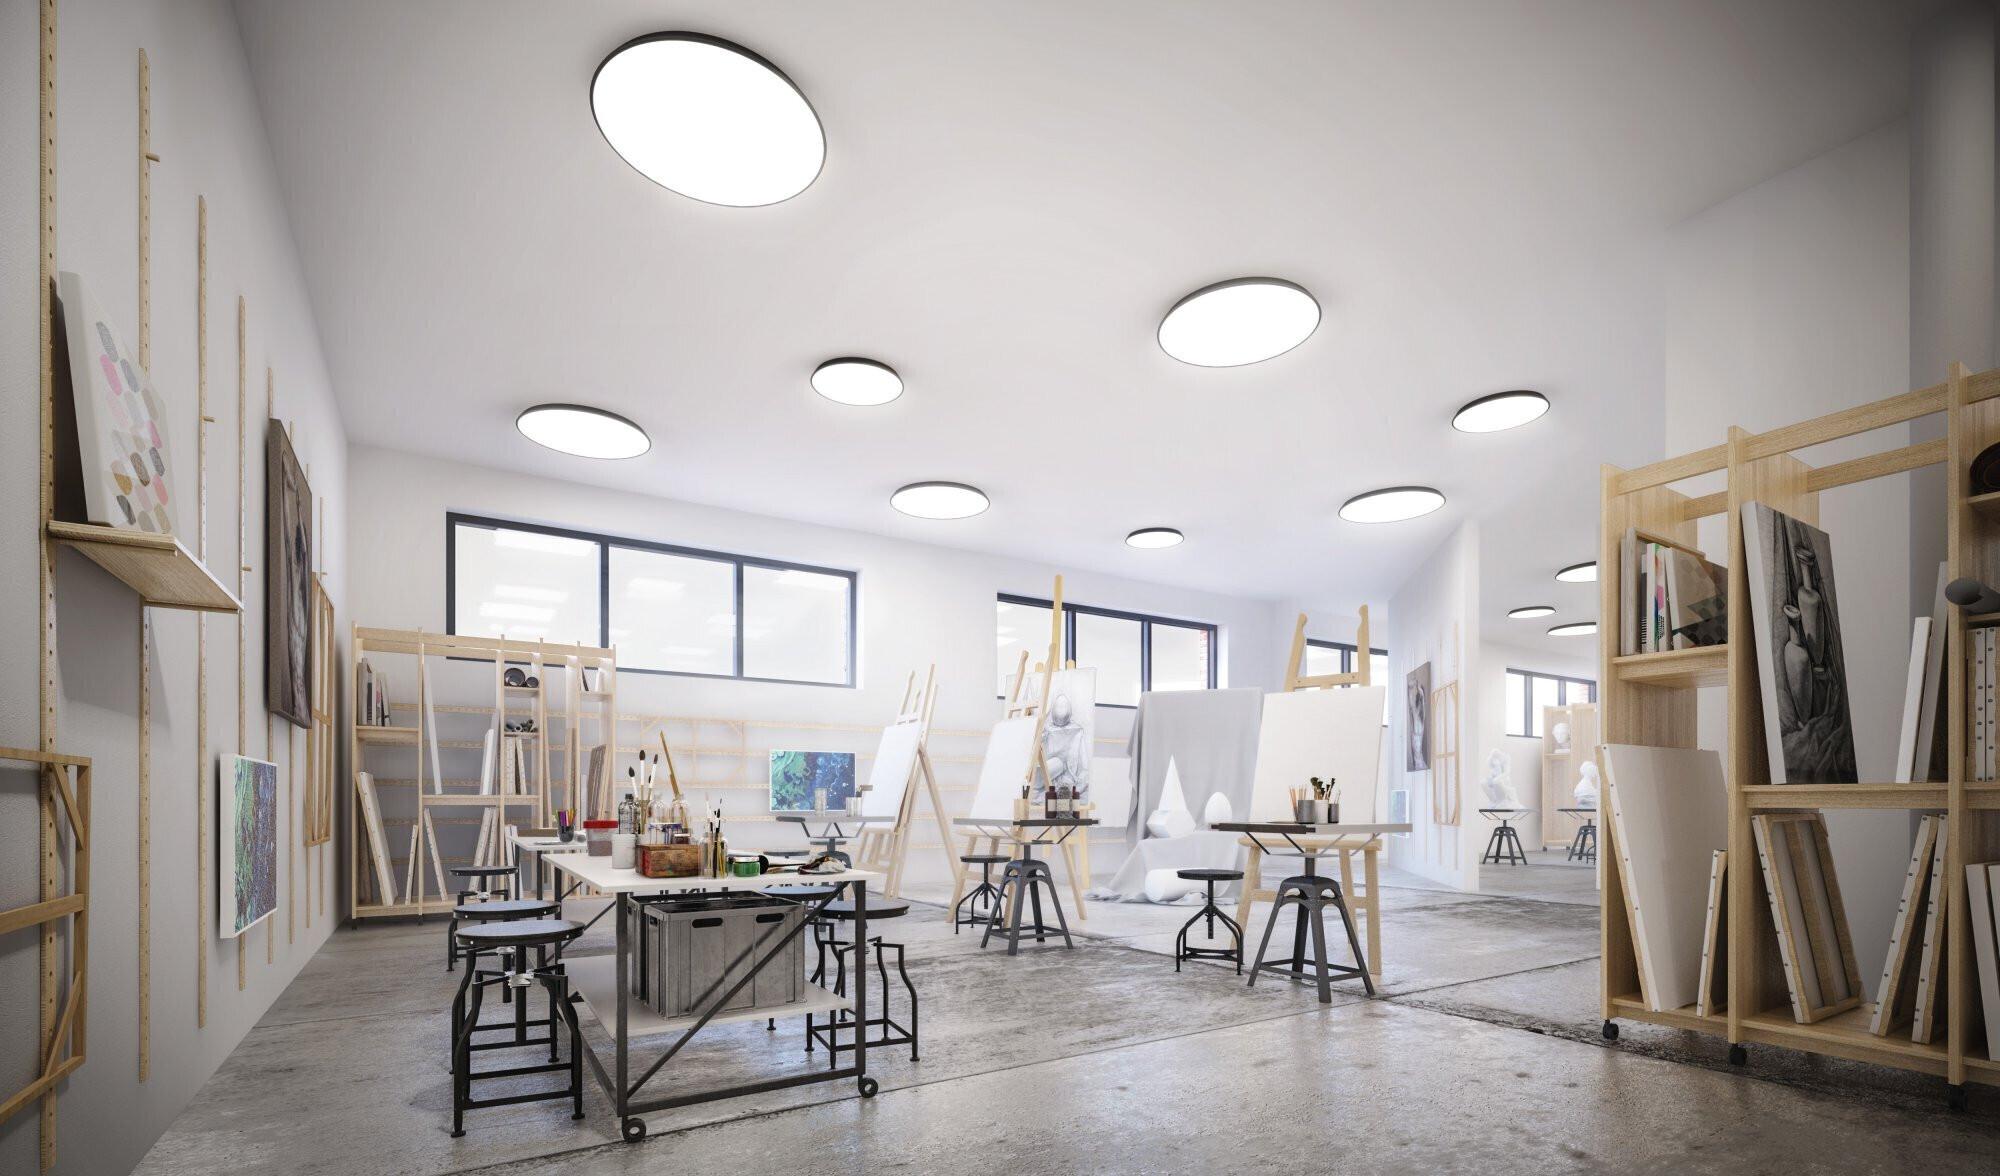 louisville-visual-arts-workspace